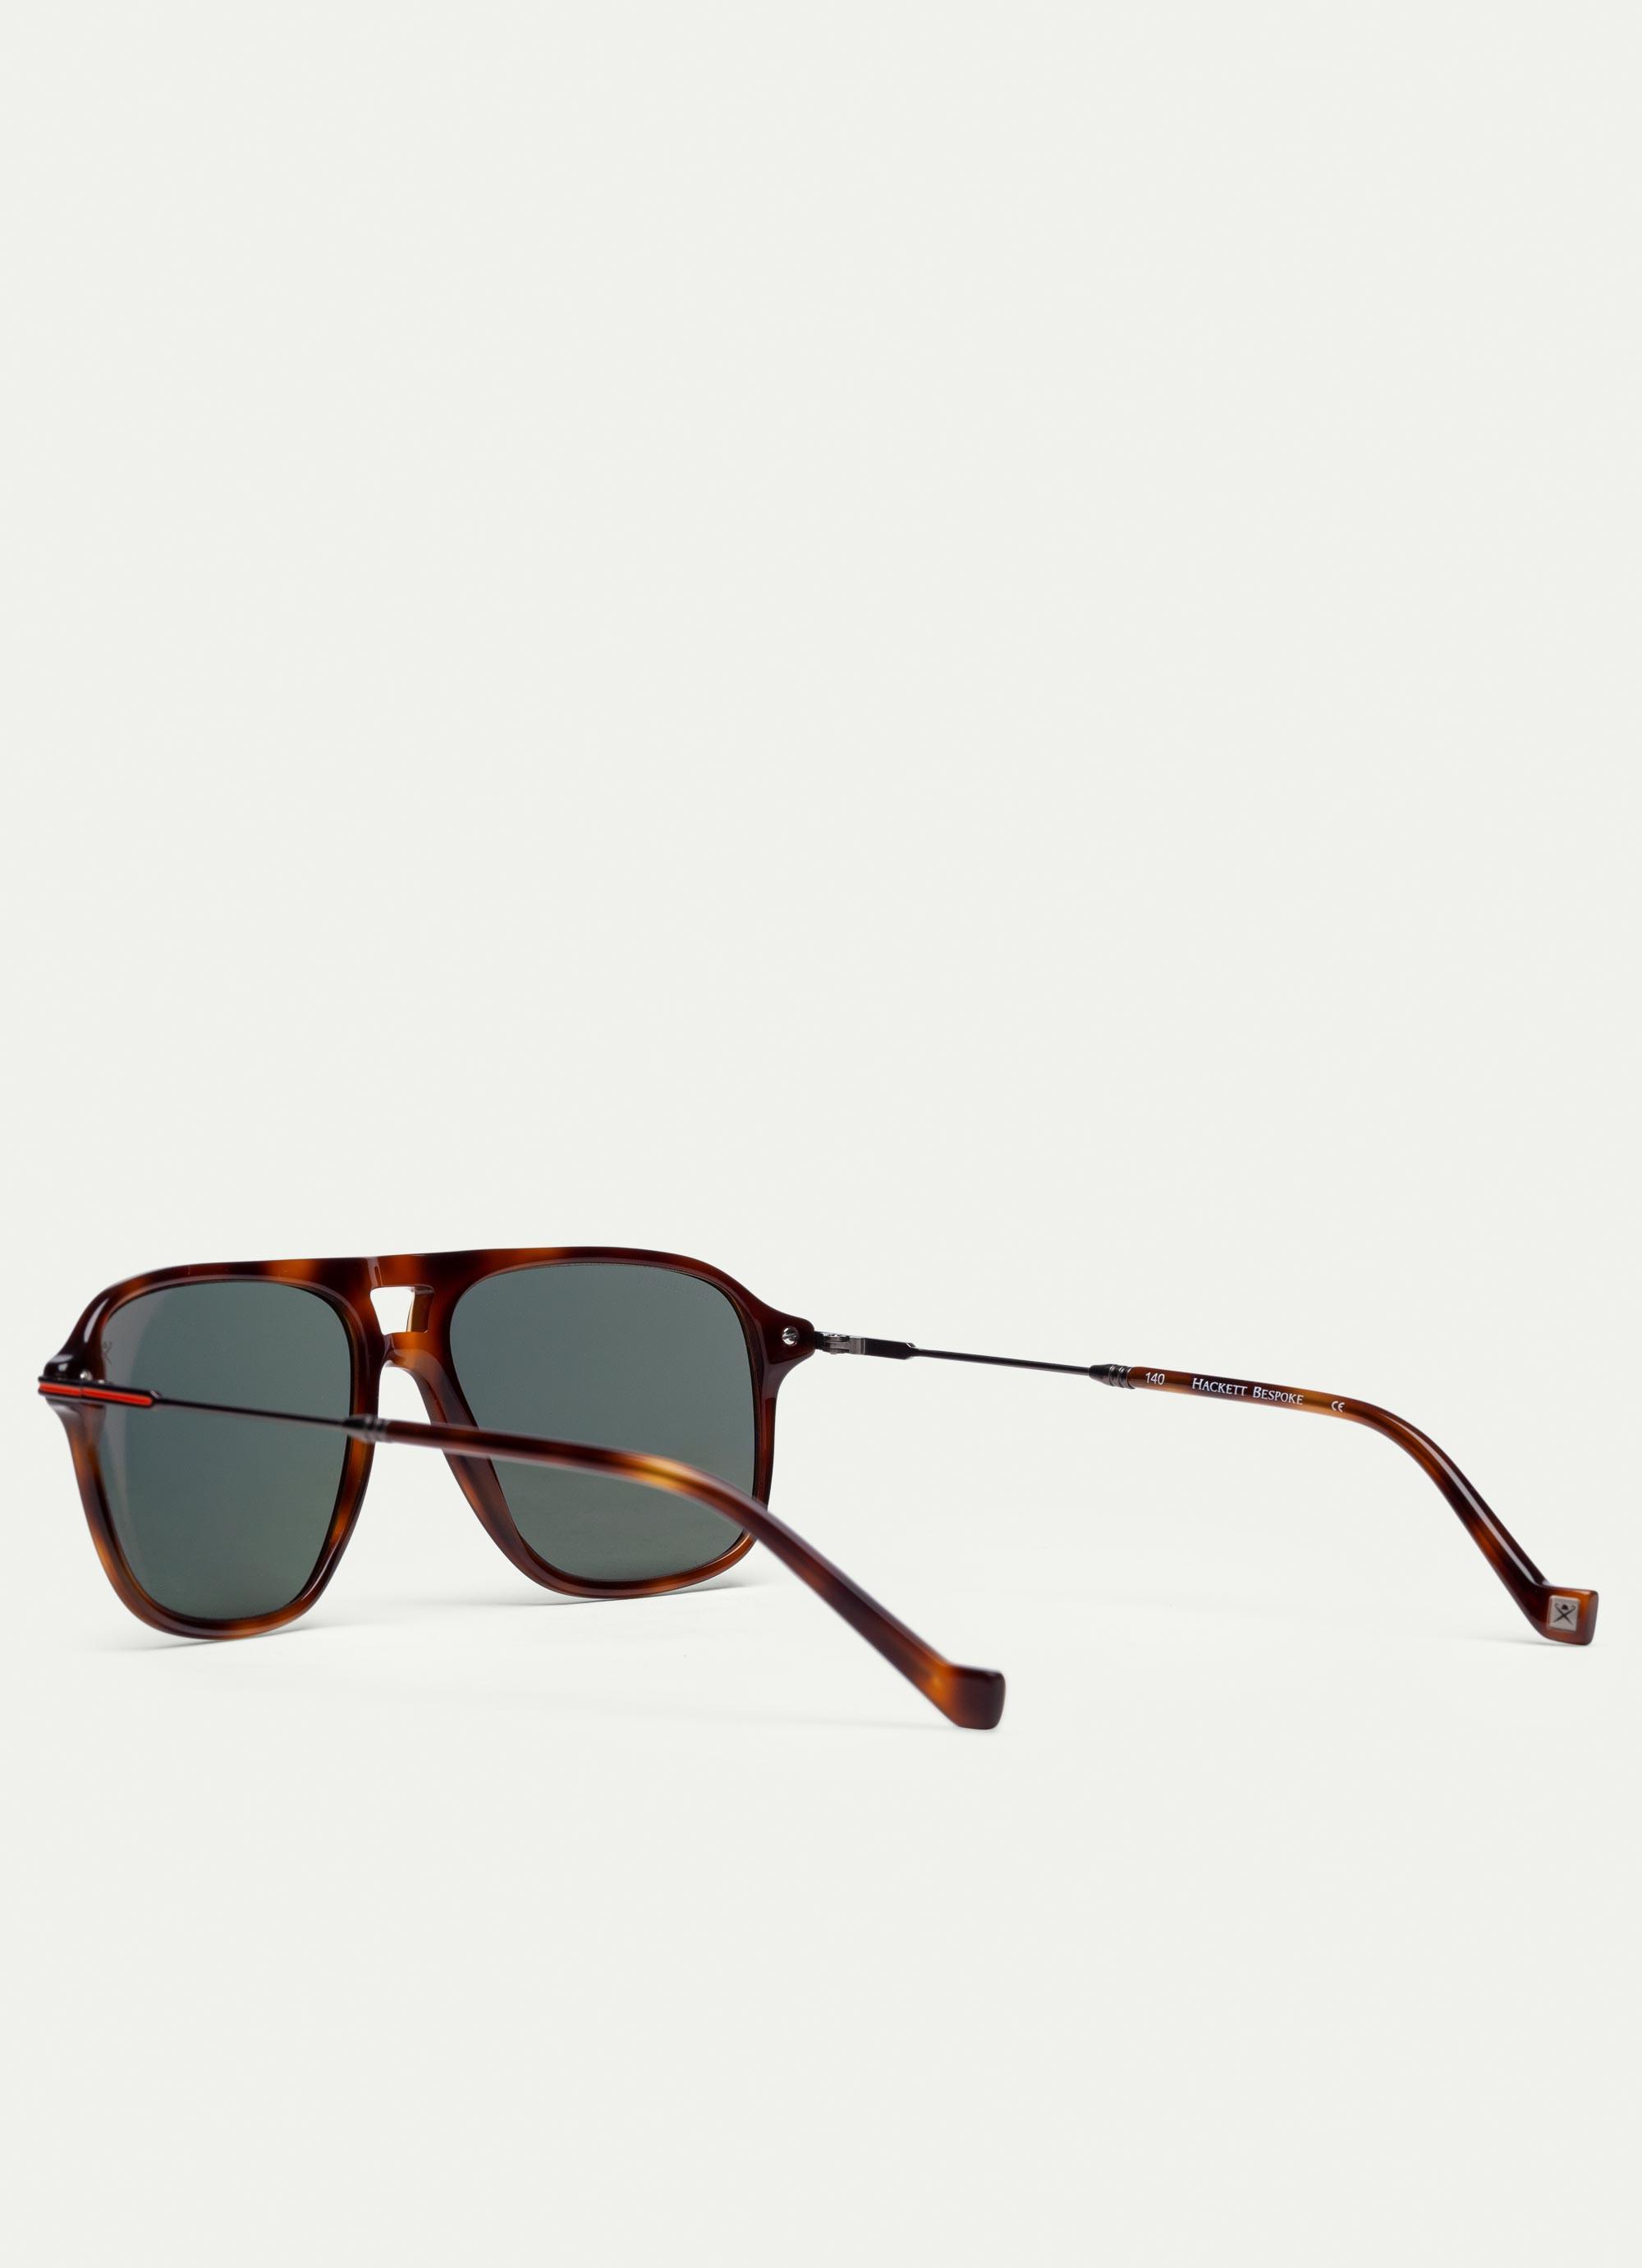 aa57b648a23 Hackett Pilot Titanium And Ultra-thin Acetate Sunglasses With ...